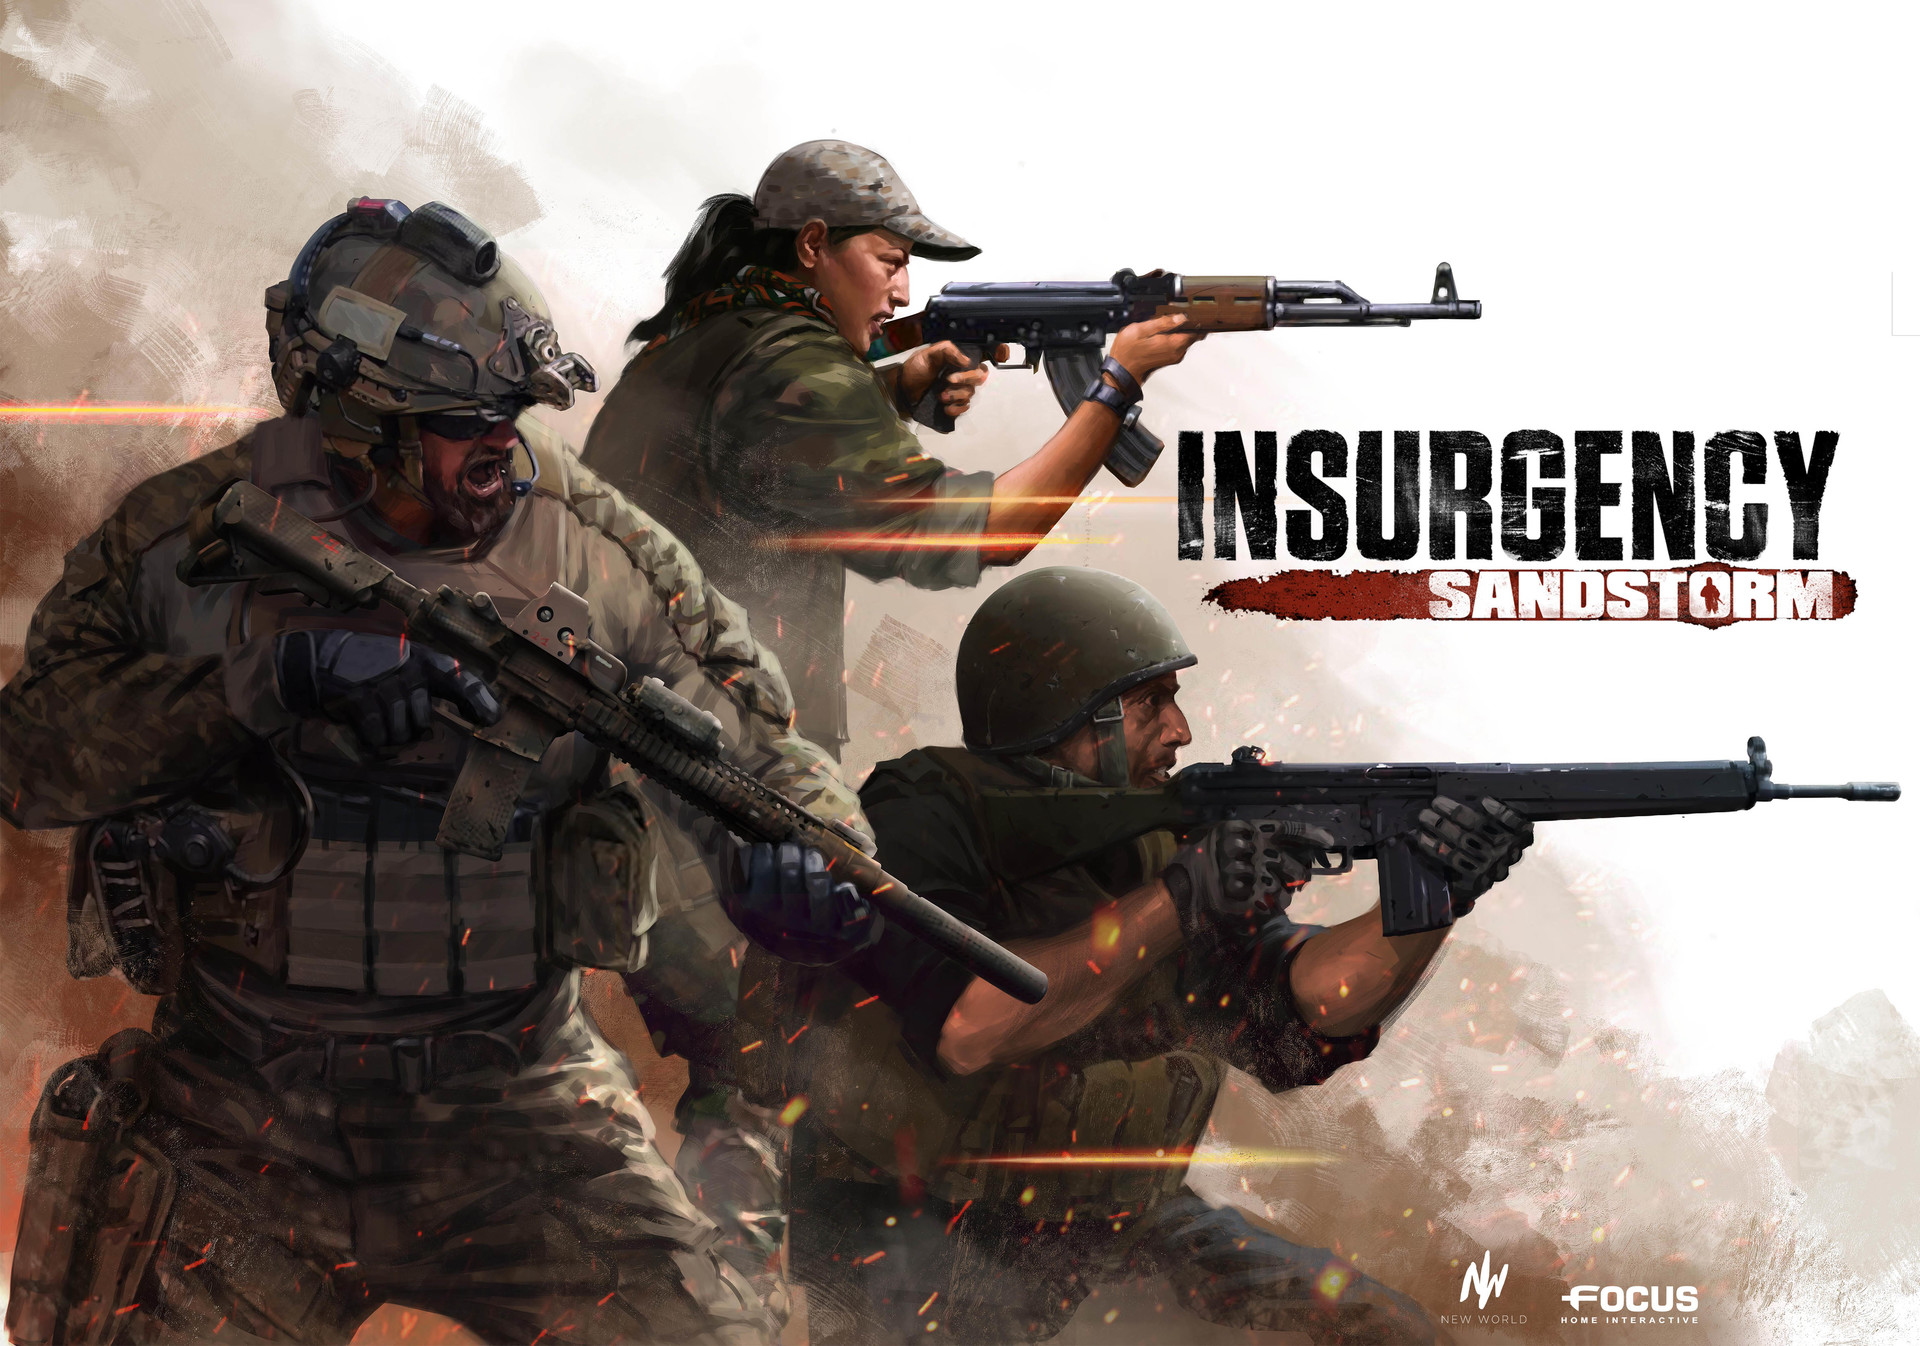 Miguel iglesias insurgency sandstorm finaldelivery forportfolio1